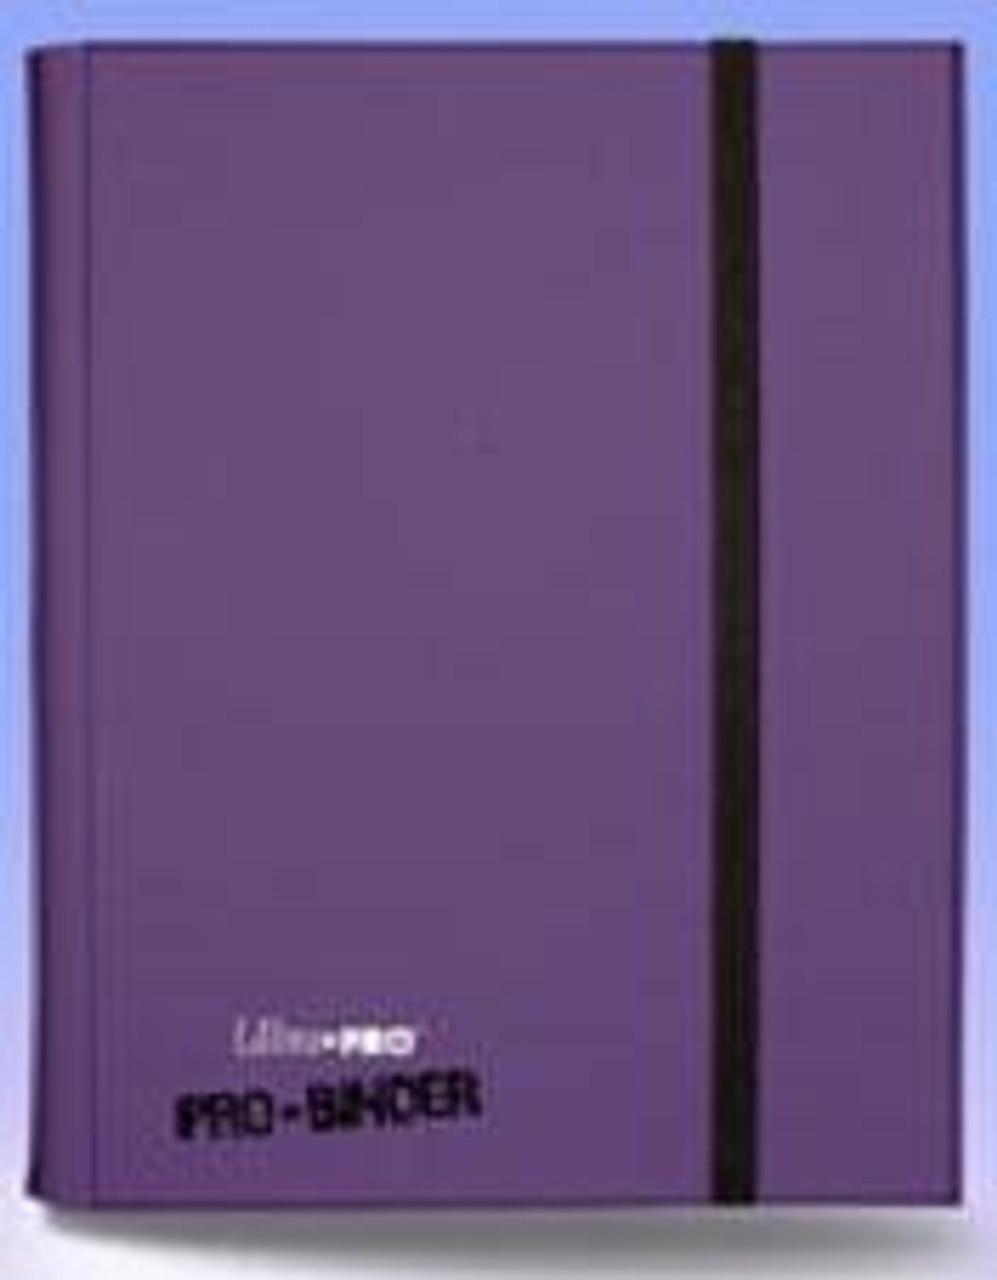 Ultra Pro Card Supplies Pro-Binder Purple 9-Pocket Binder